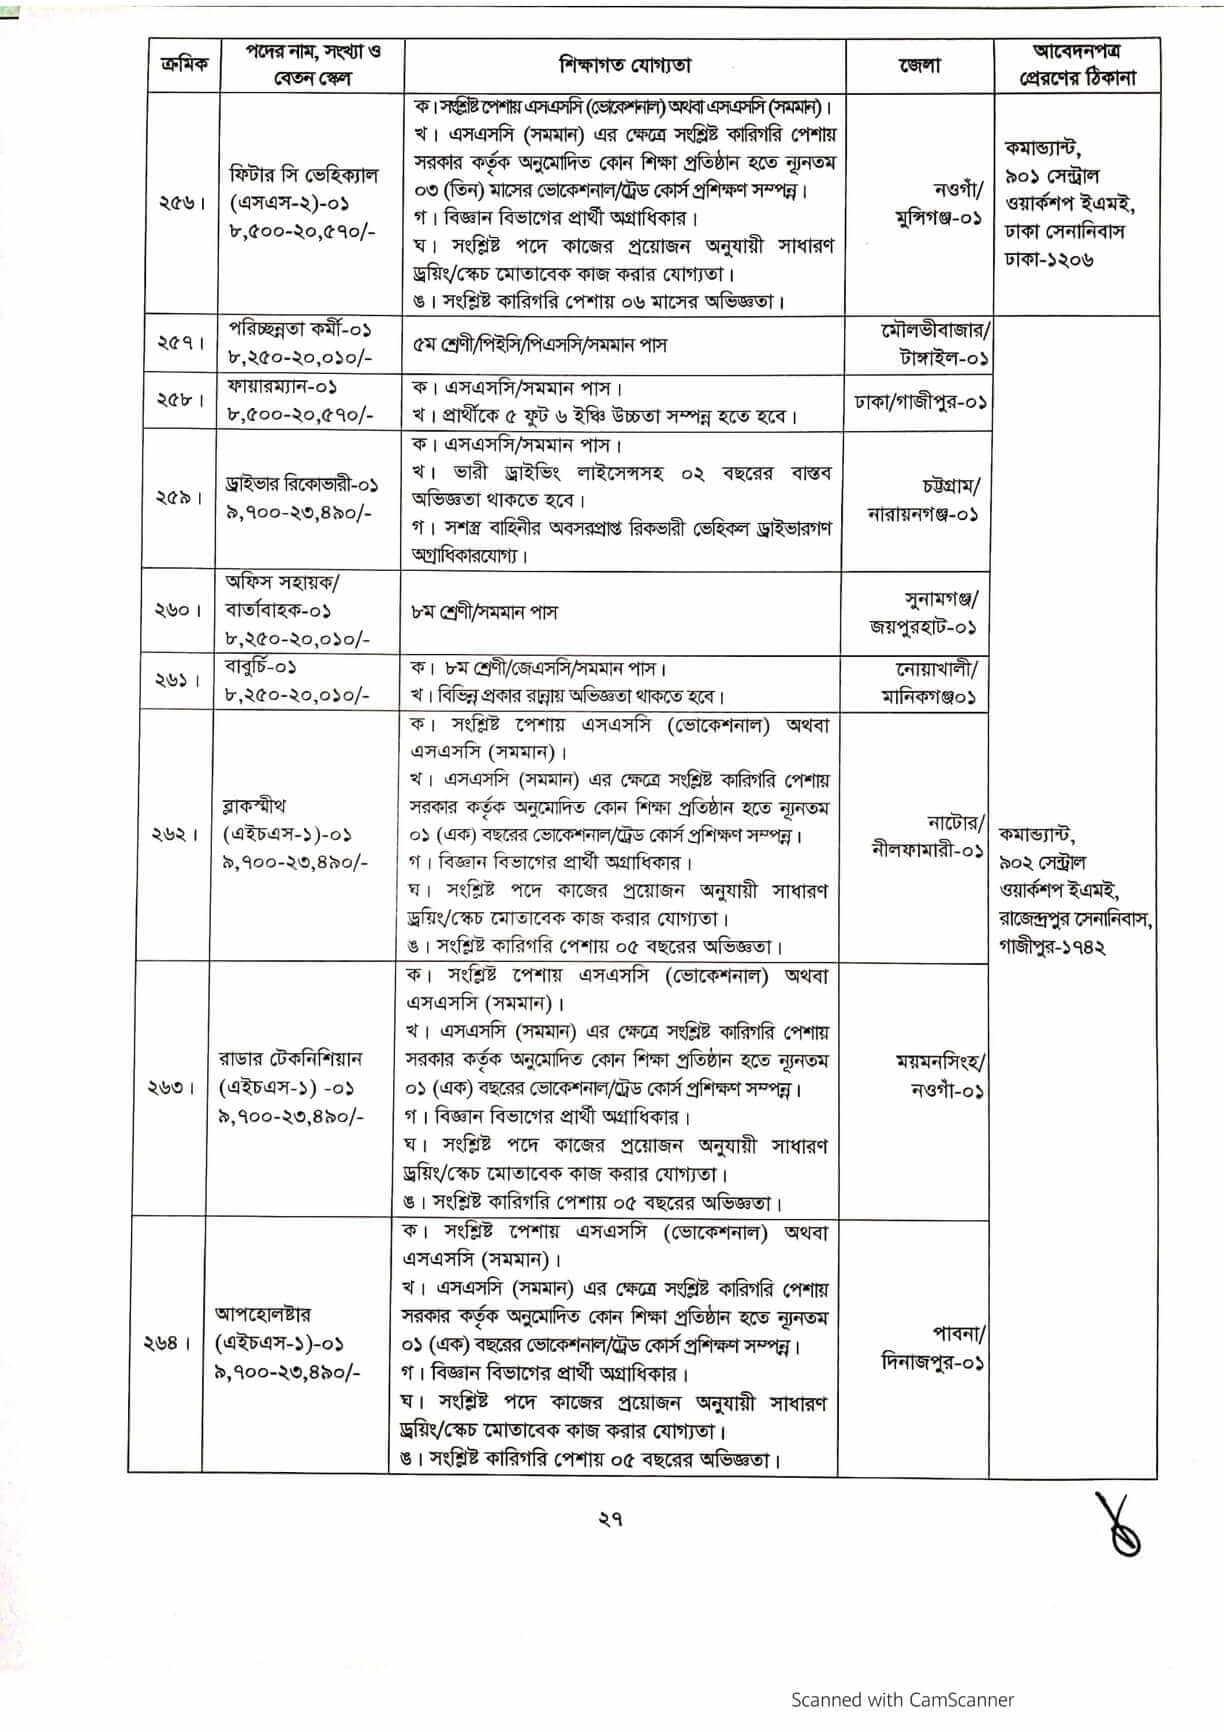 www.army.mil.bd Job Circular 2021